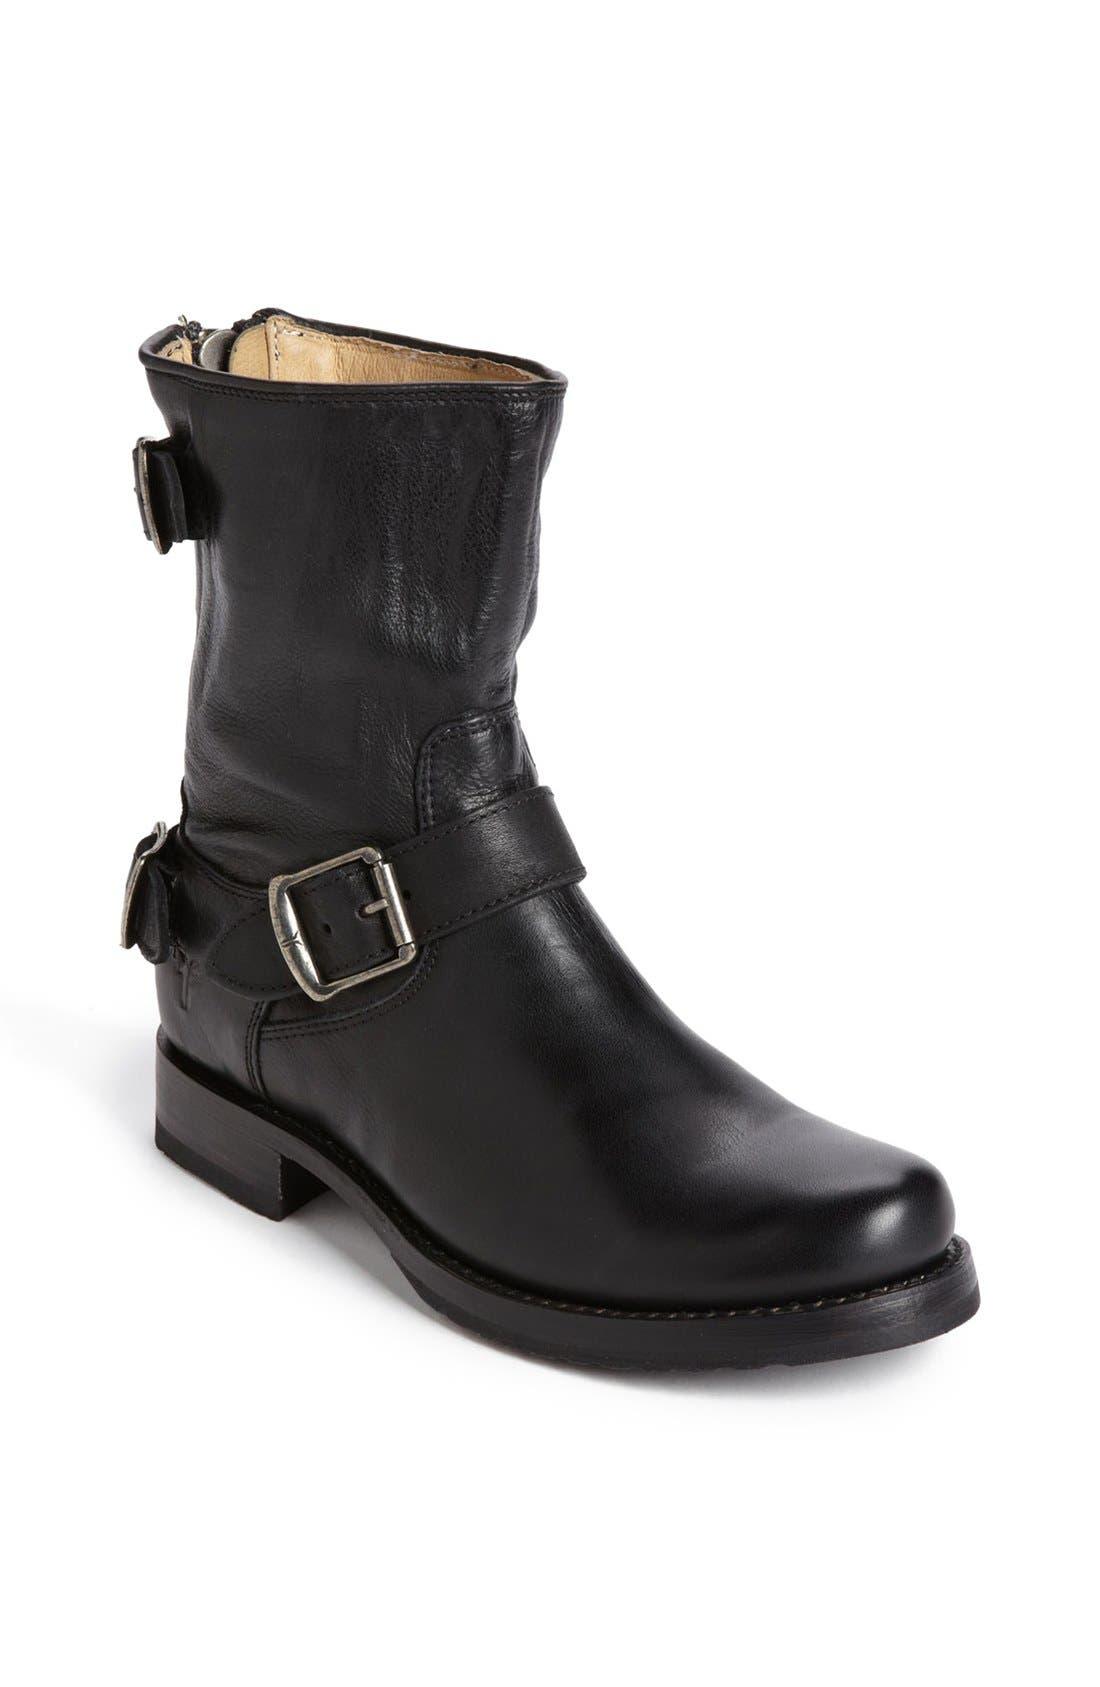 Alternate Image 1 Selected - Frye 'Veronica' Back Zip Short Boot